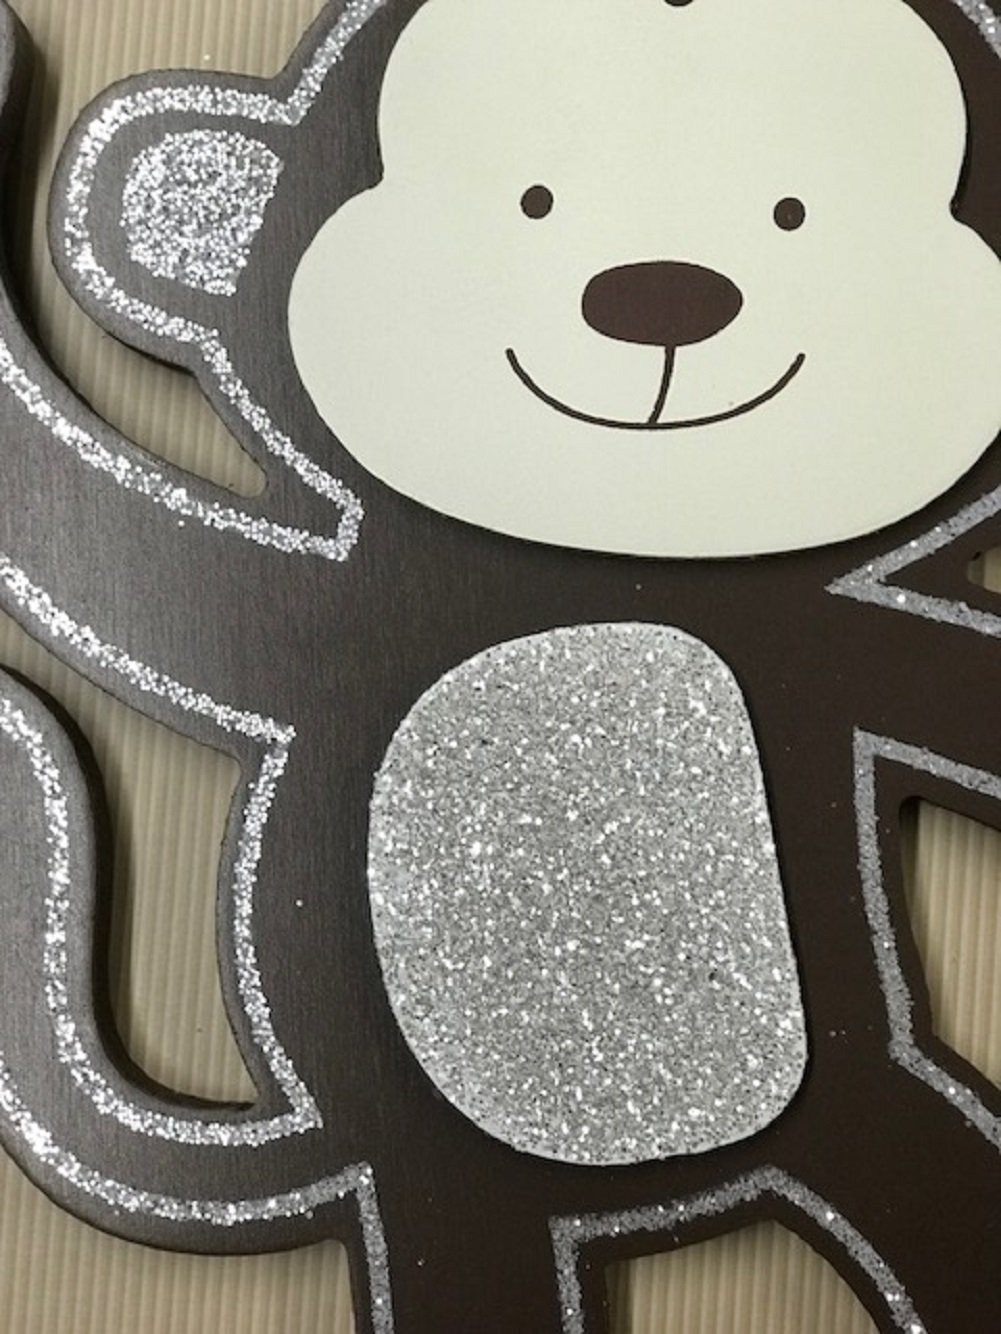 Amazon.com: Koala bebé overol de pared (Madera Decoración: Baby